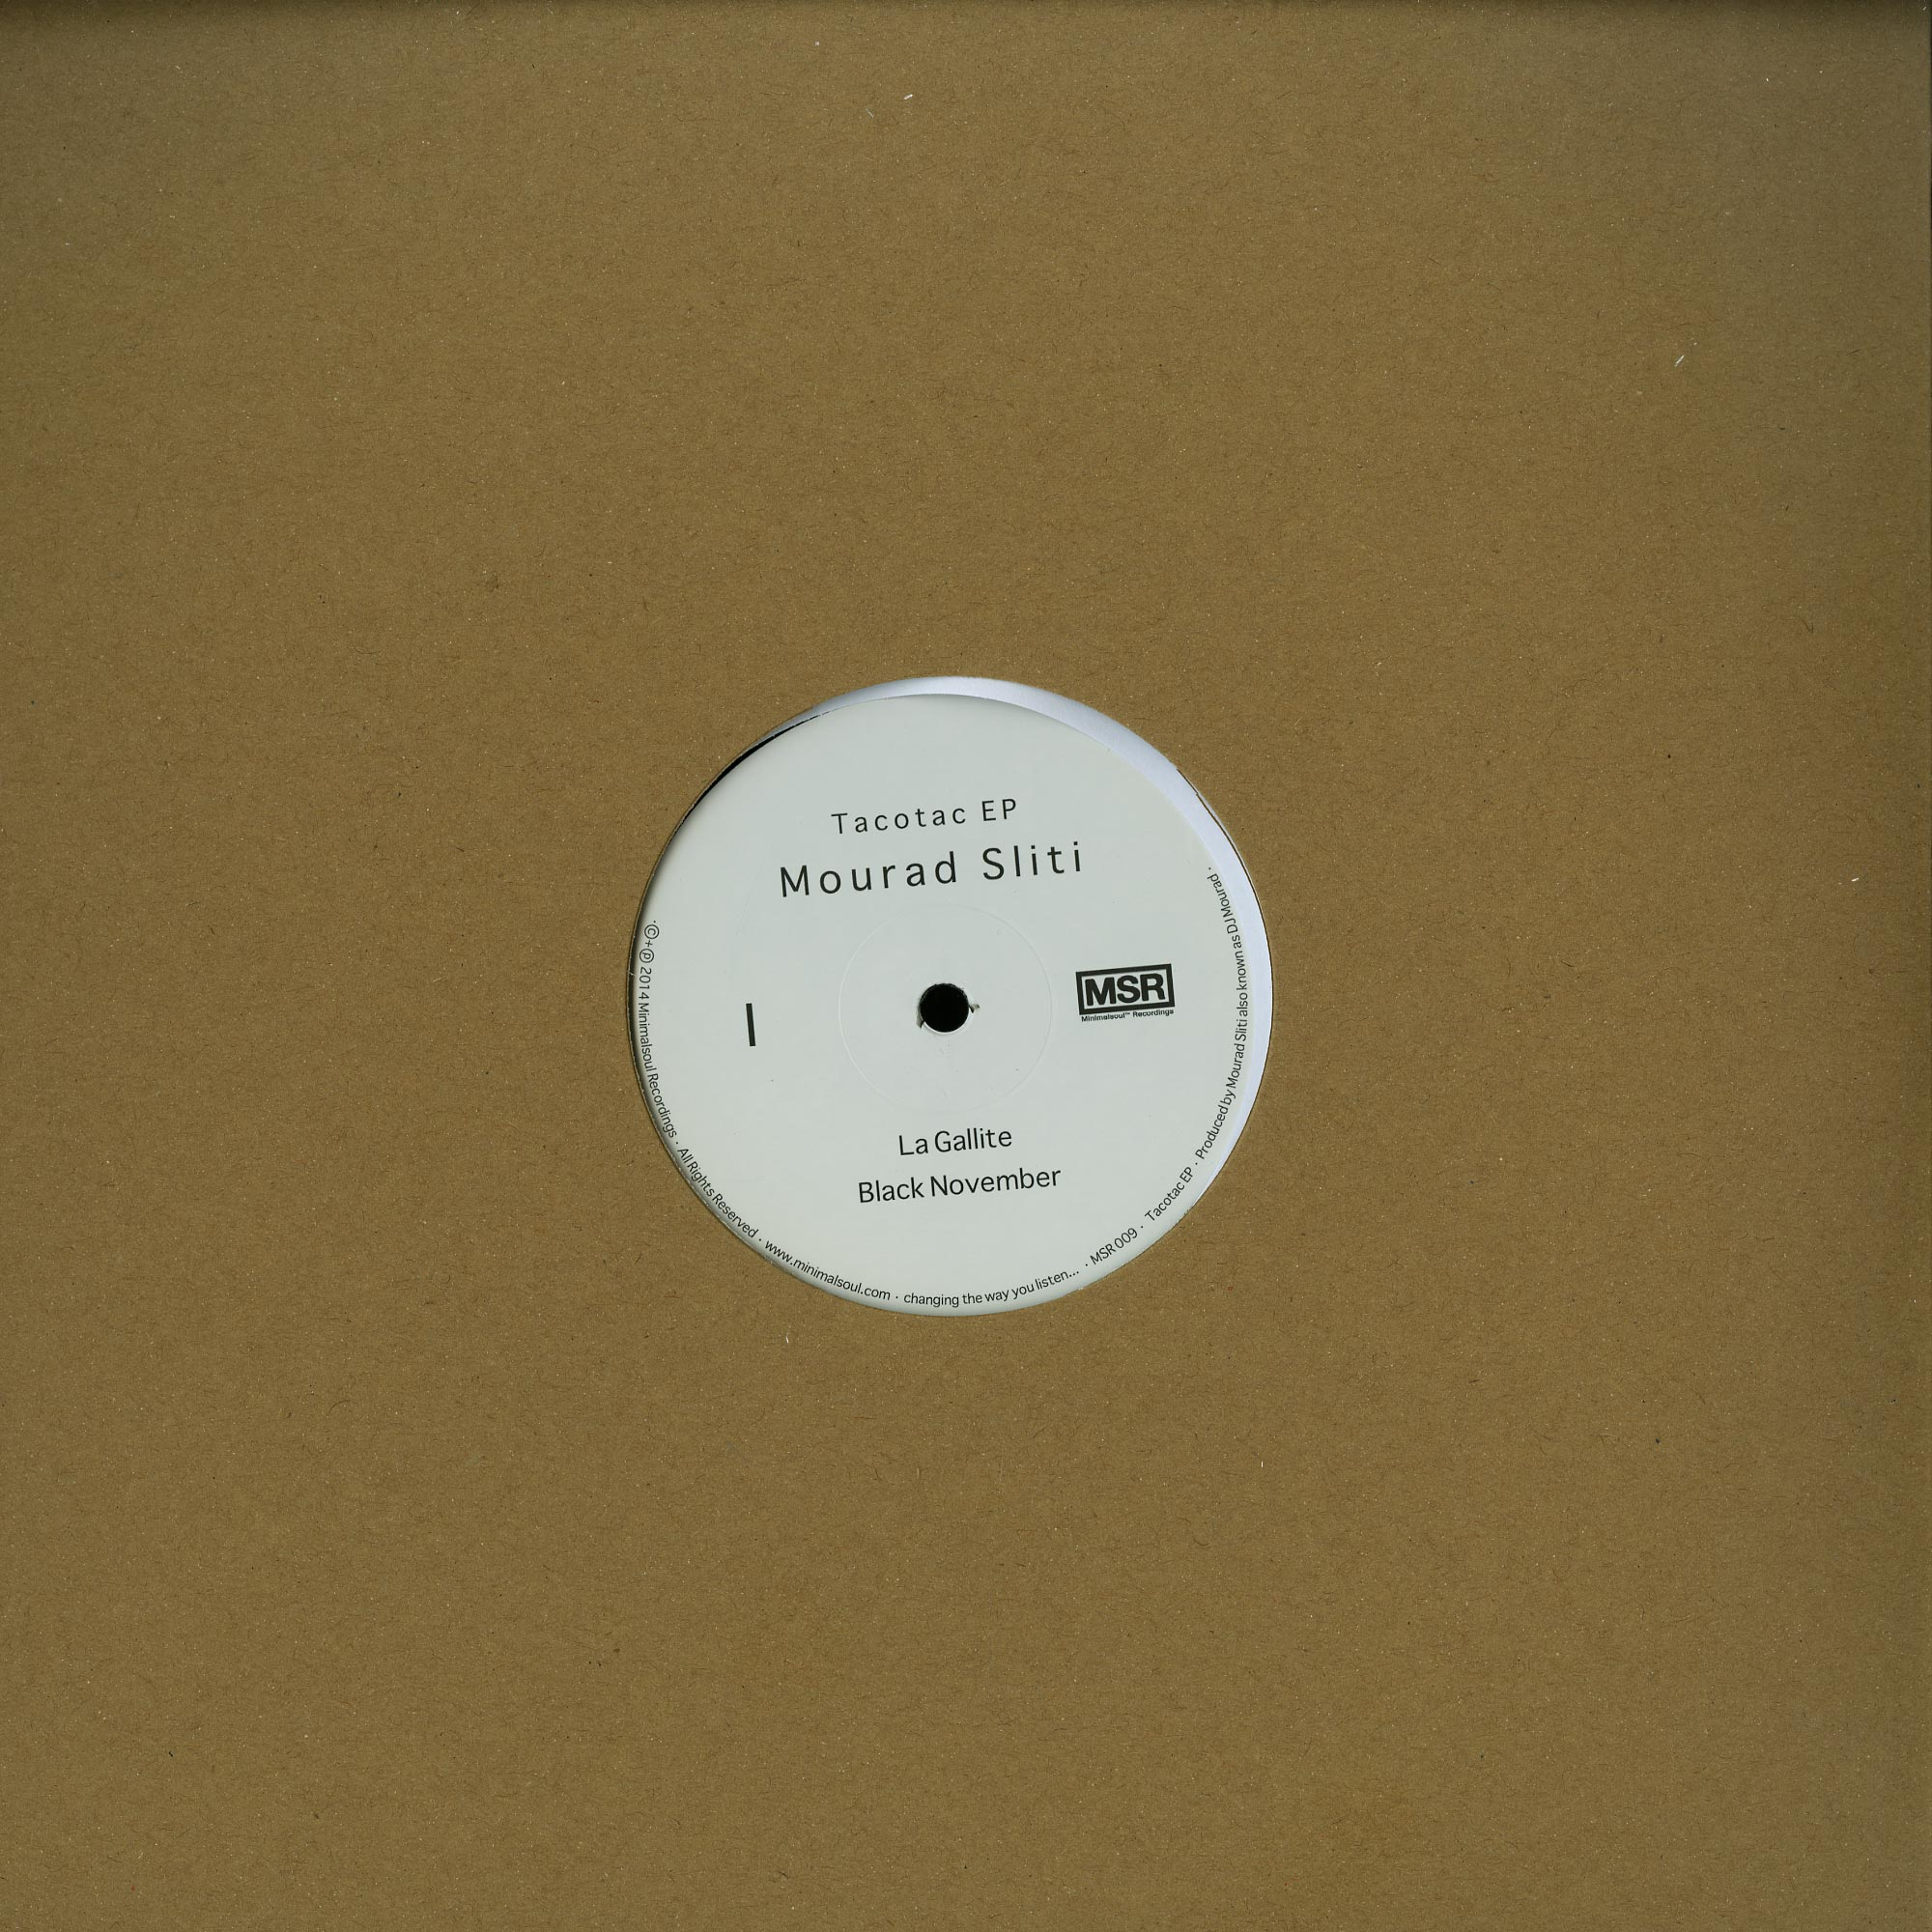 Mourad Sliti - TACOTAC EP